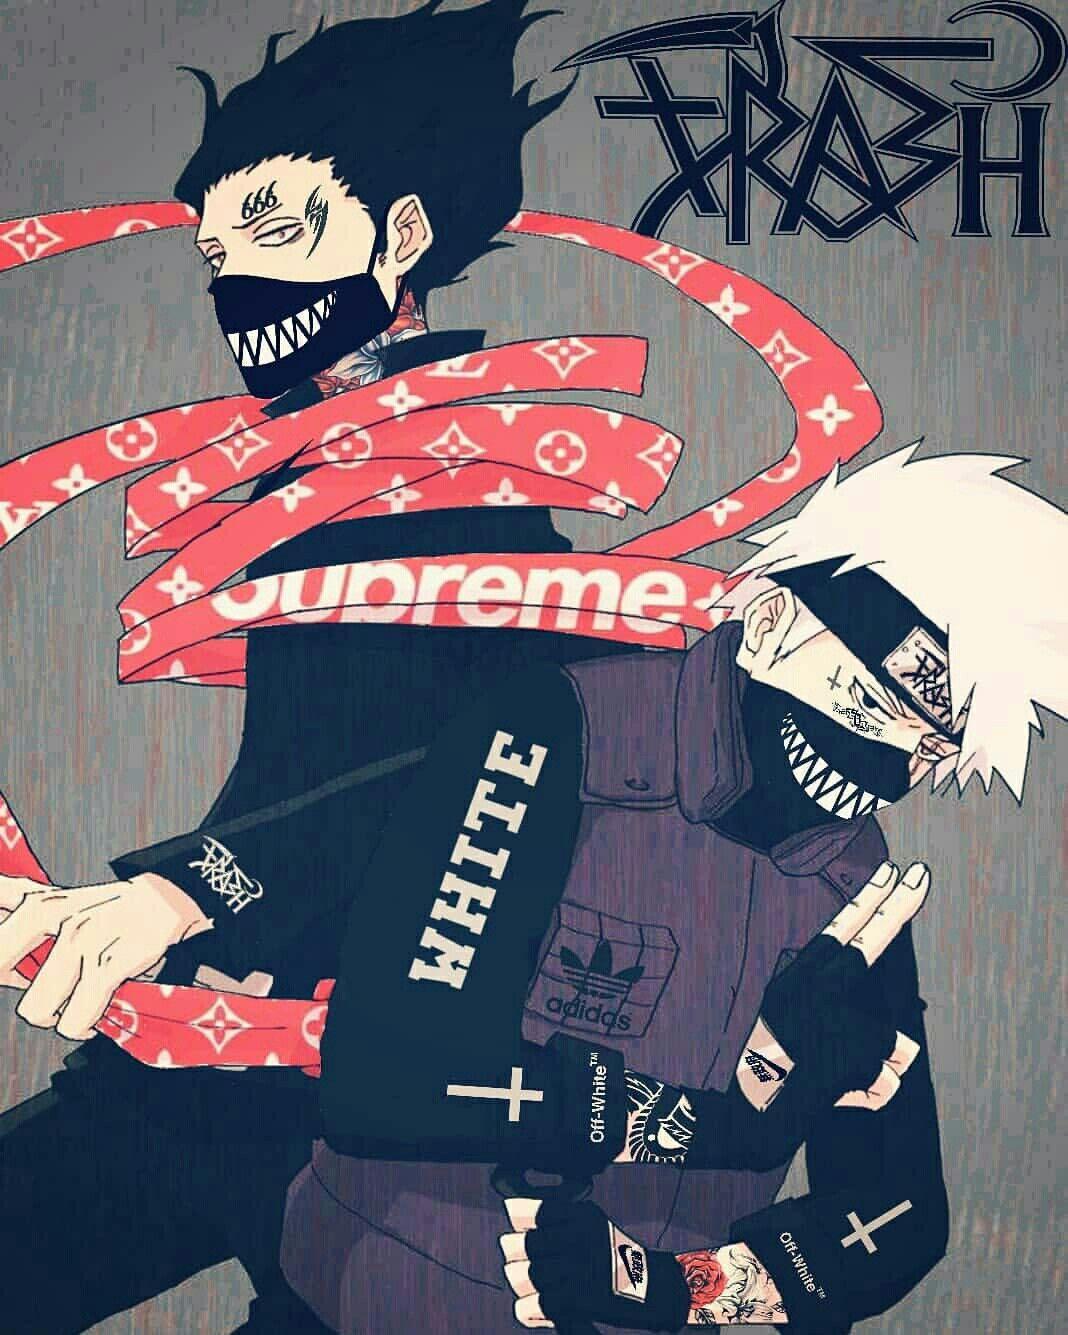 Pain Naruto Wallpaper: Pin By SSJSteffan On Anime (FASHION AND EDITS)